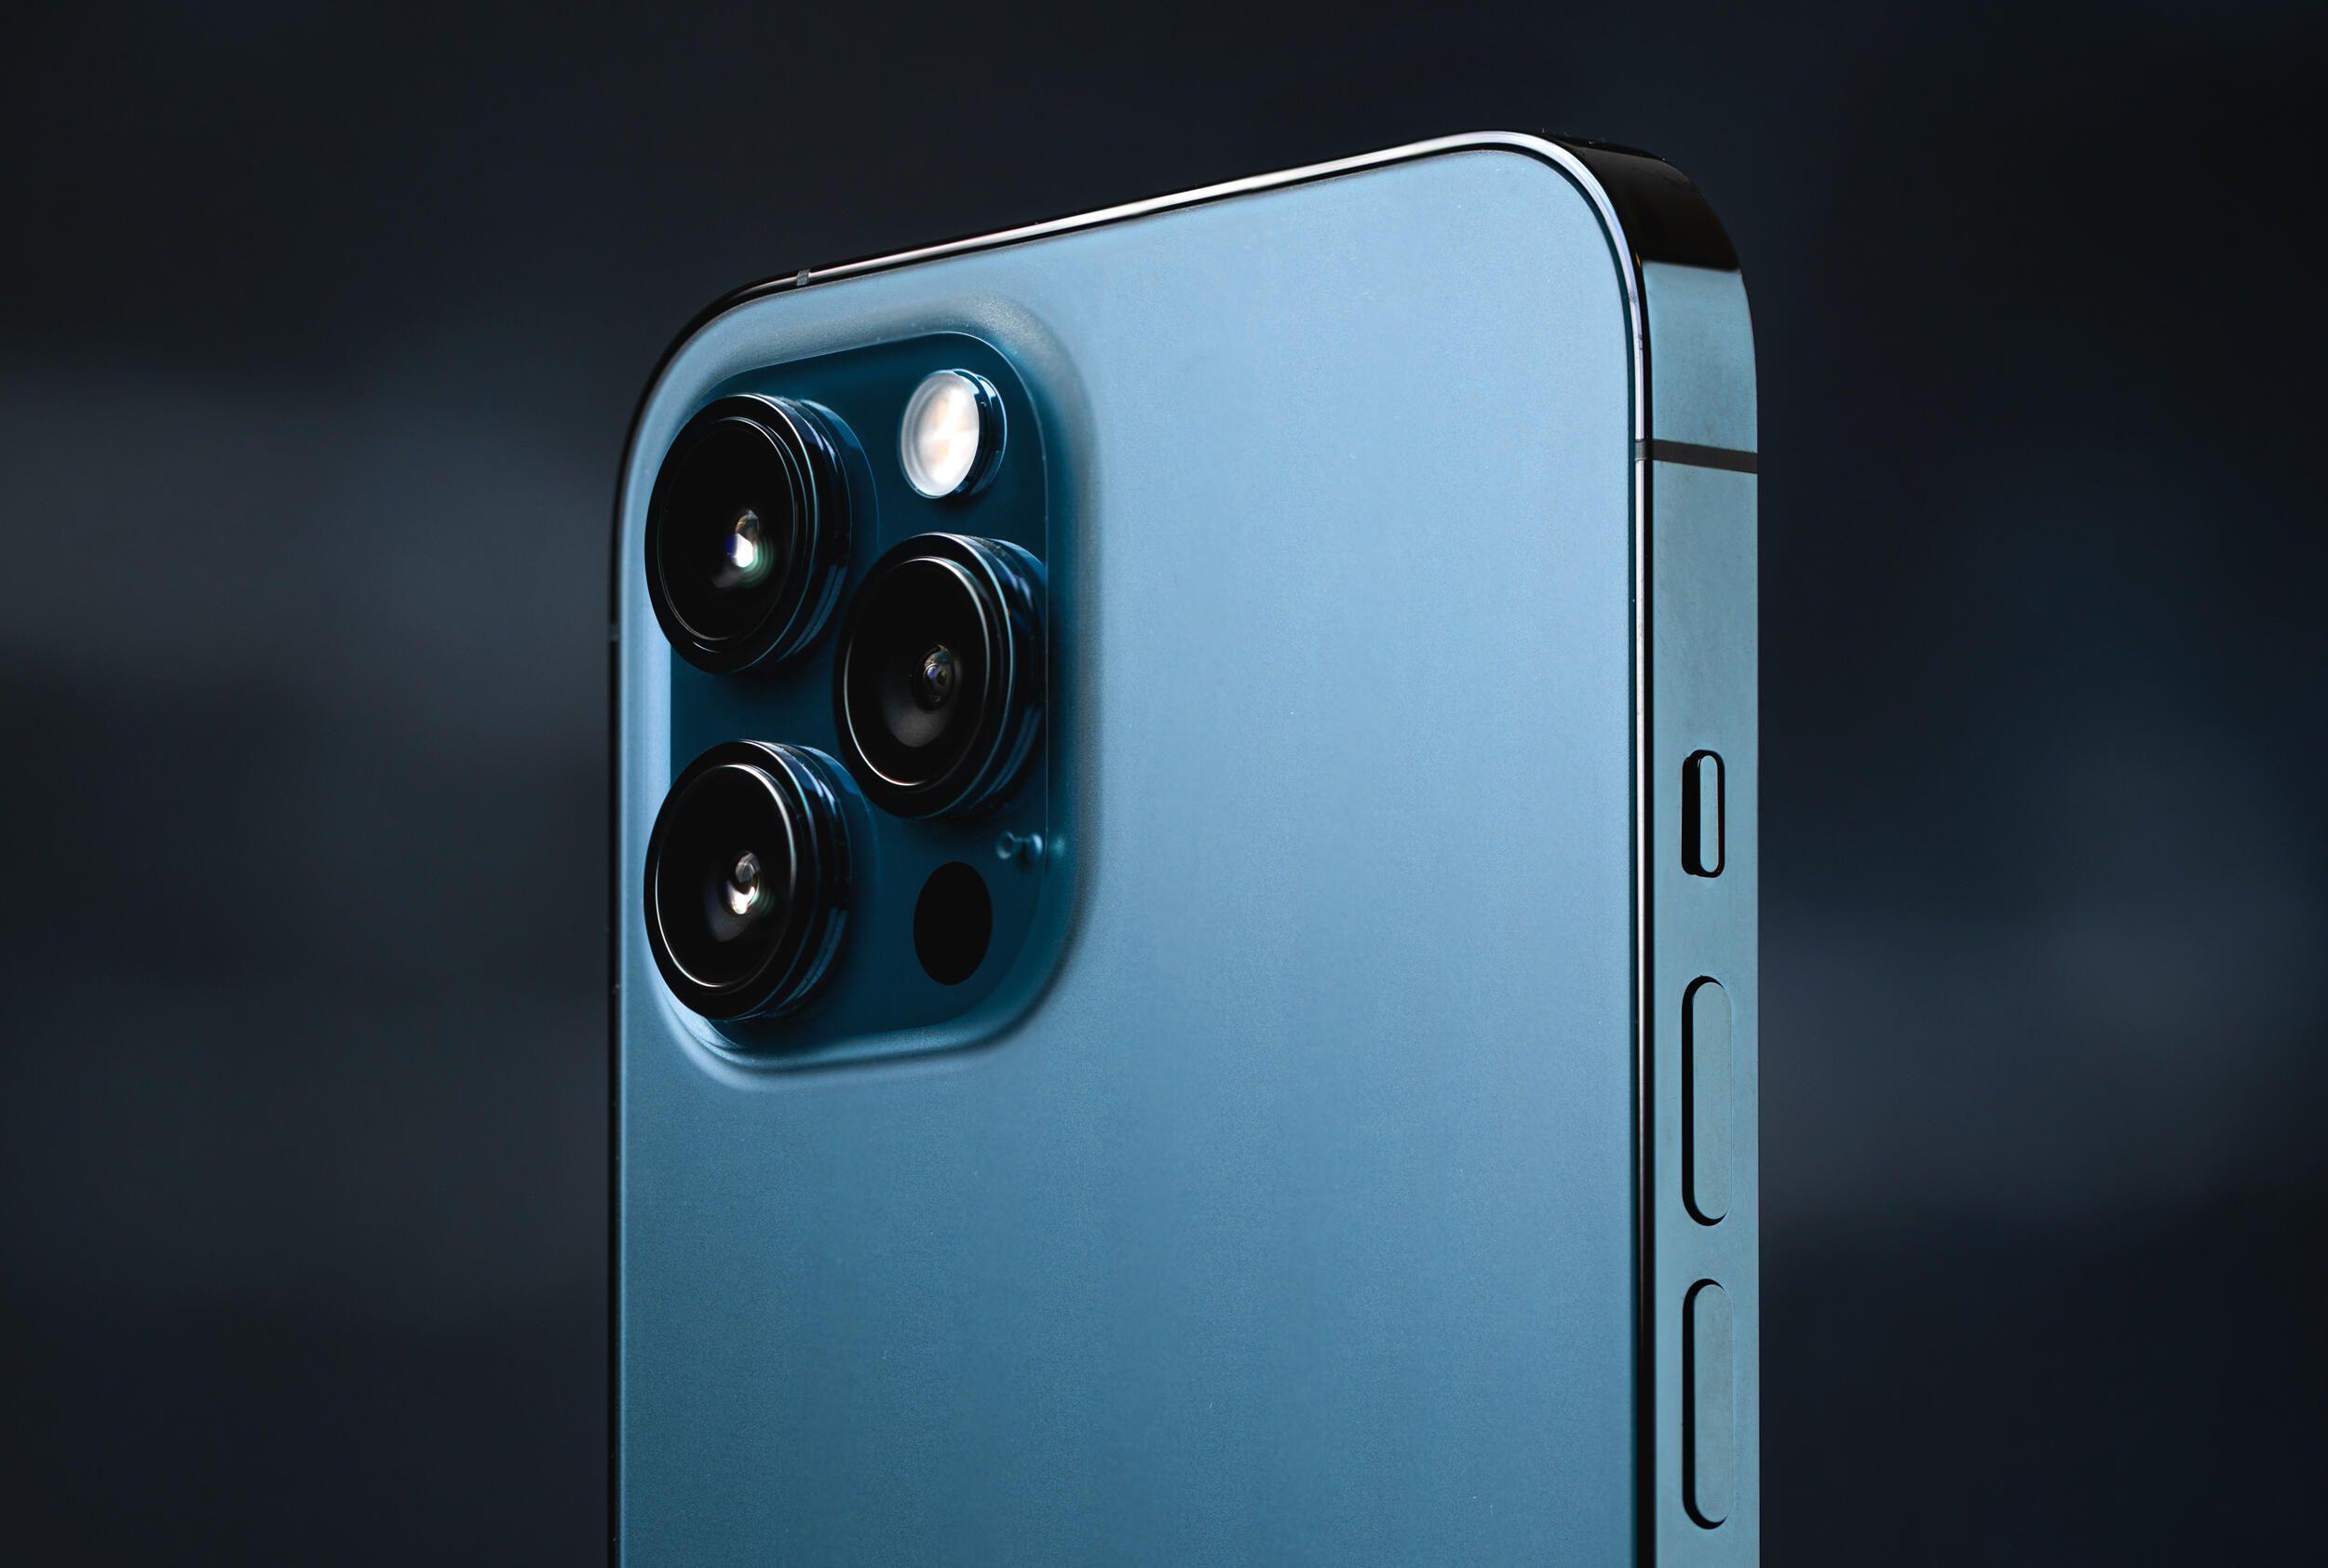 iphone-12-pro-max-hoyle-producto-hero-3